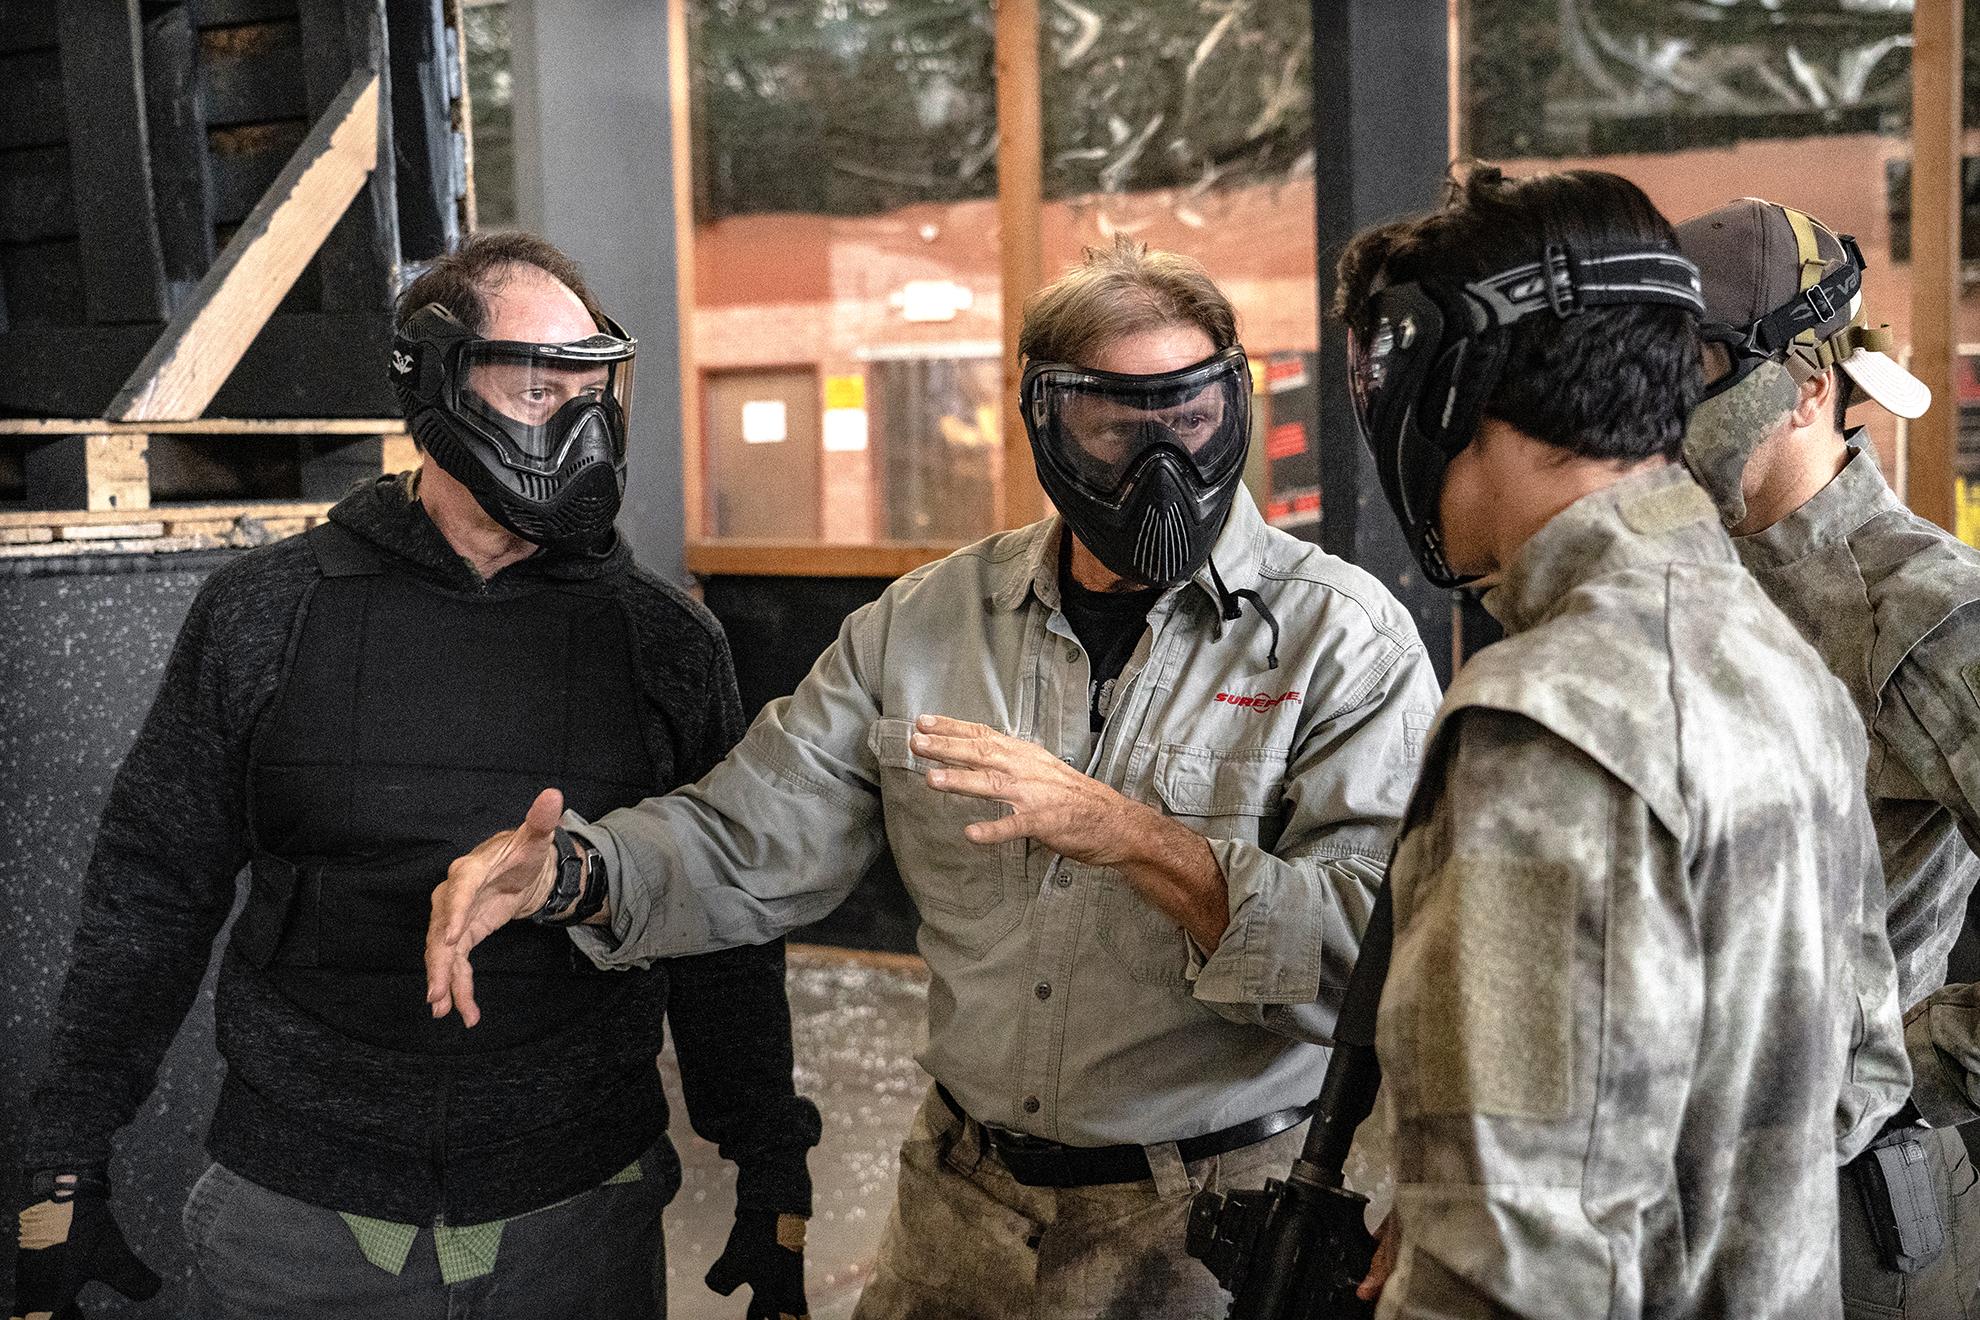 Dave Maynard at Warfighter Academy firearms training